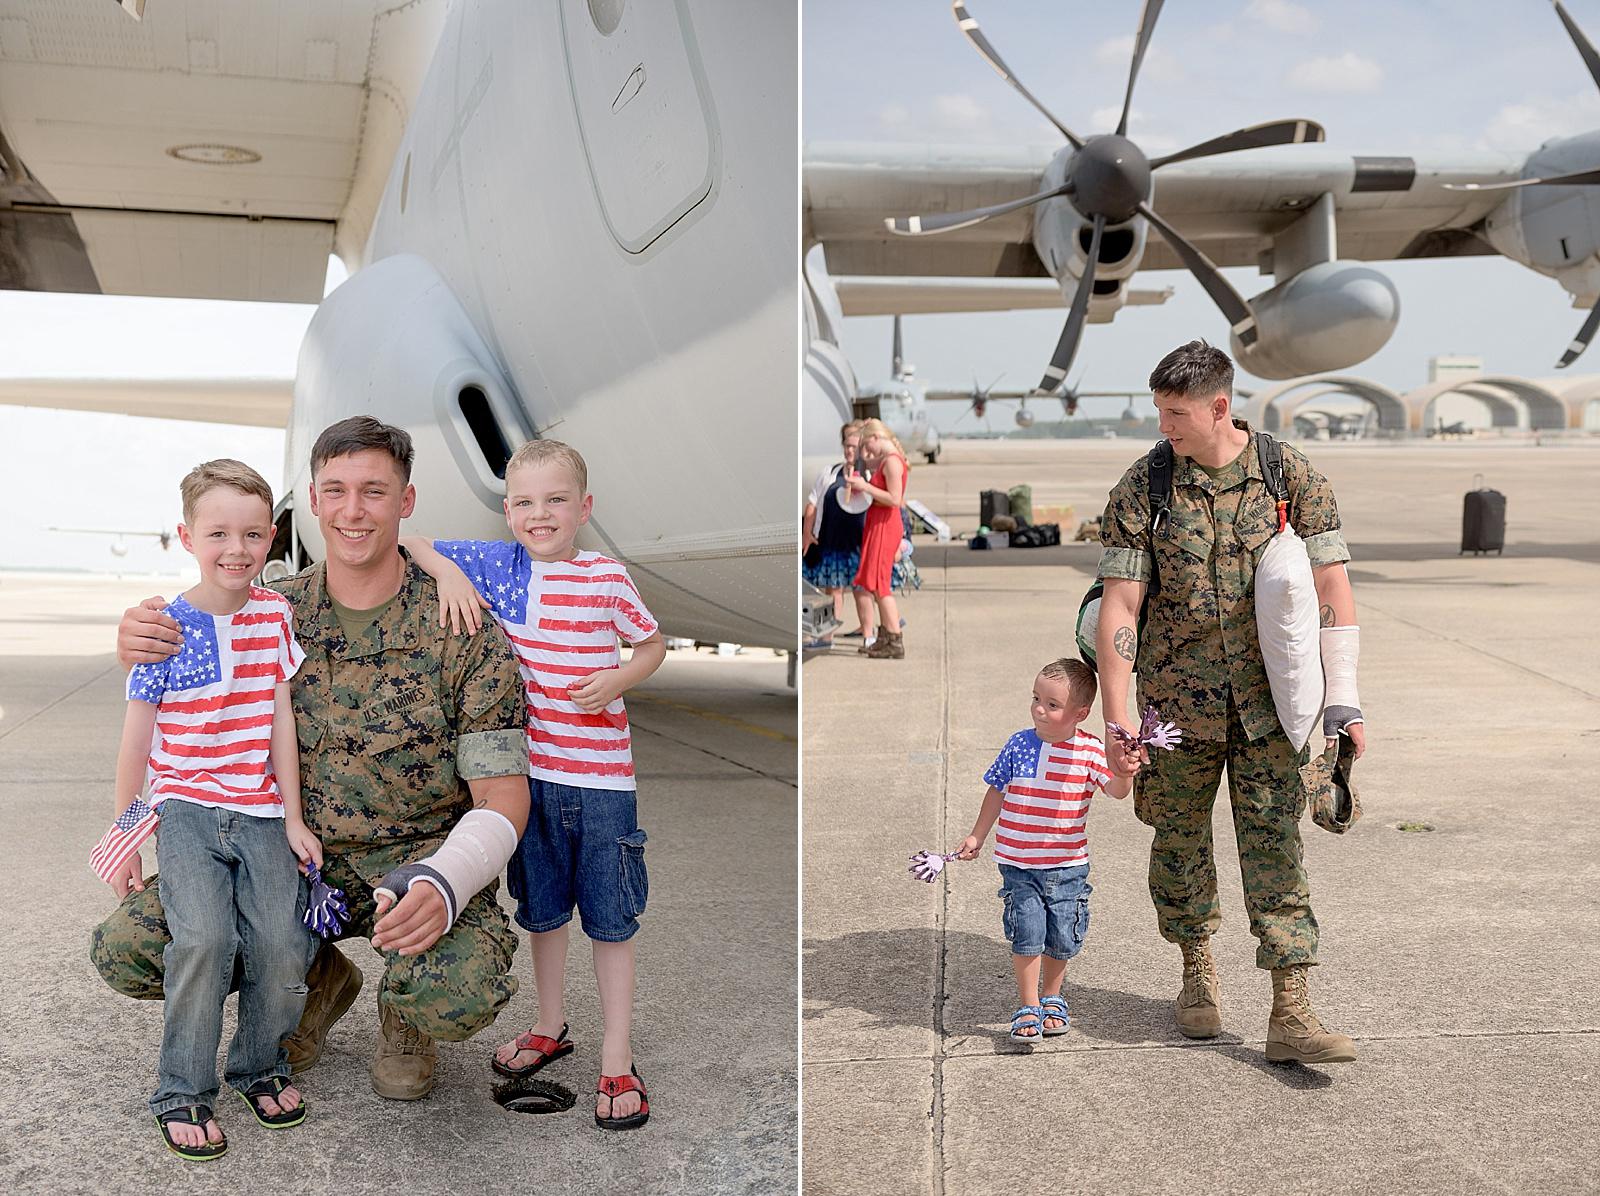 USMC C-130 homecoming photography at MCAS Cherry Point from North Carolina portrait photographer Lauren Nygard